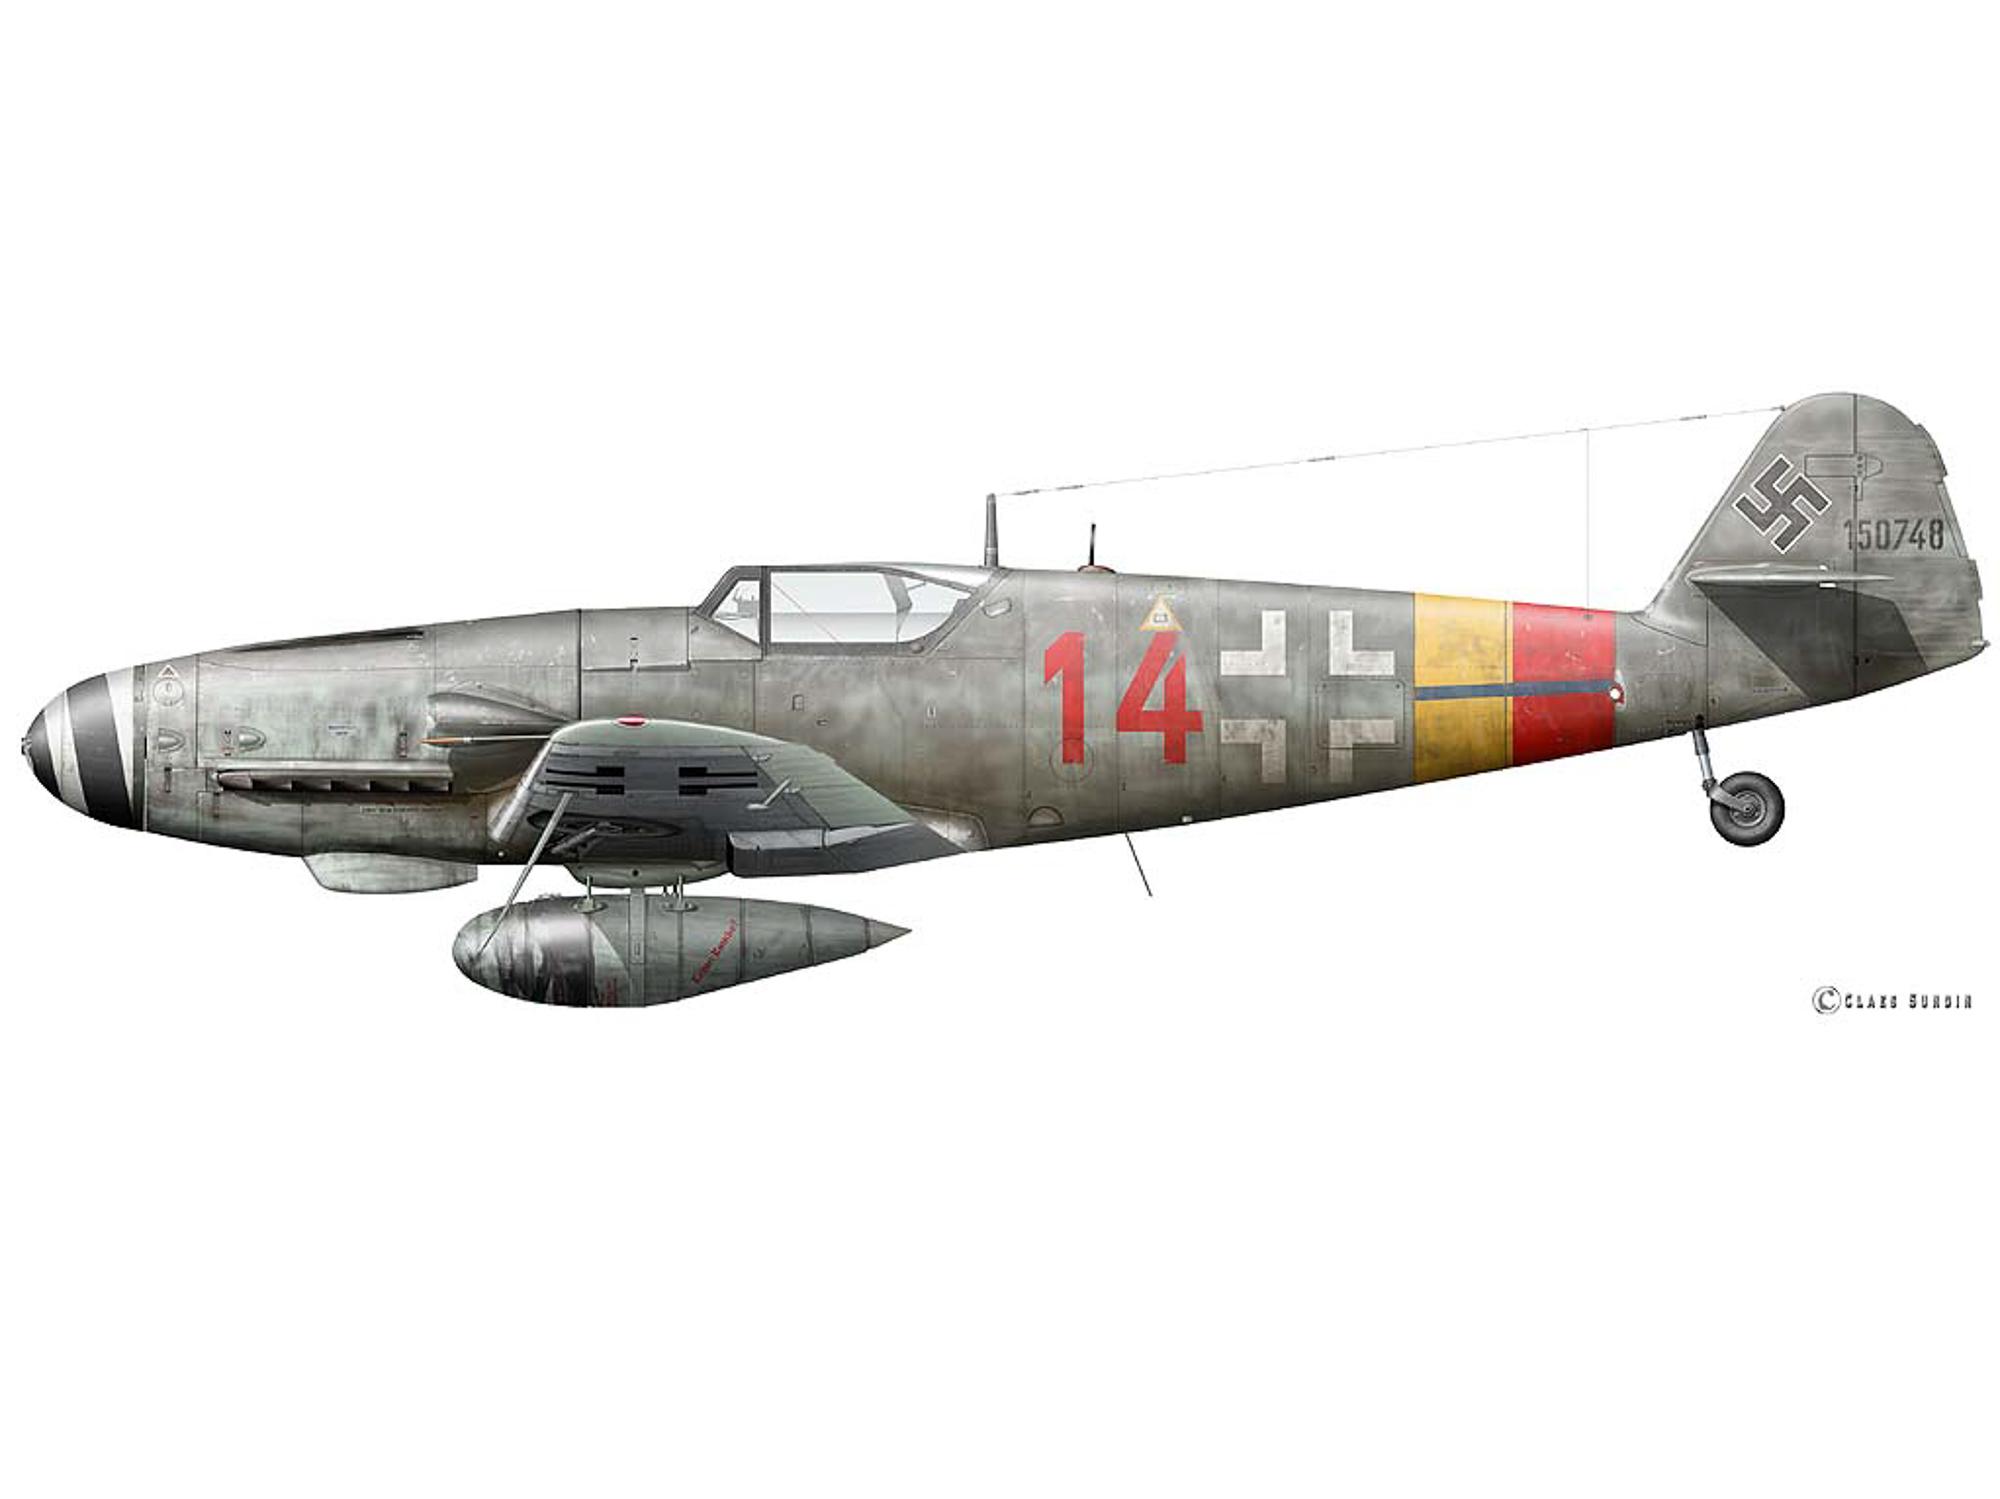 Bf 109G-10 - Red 14 - W.Nr. 150748